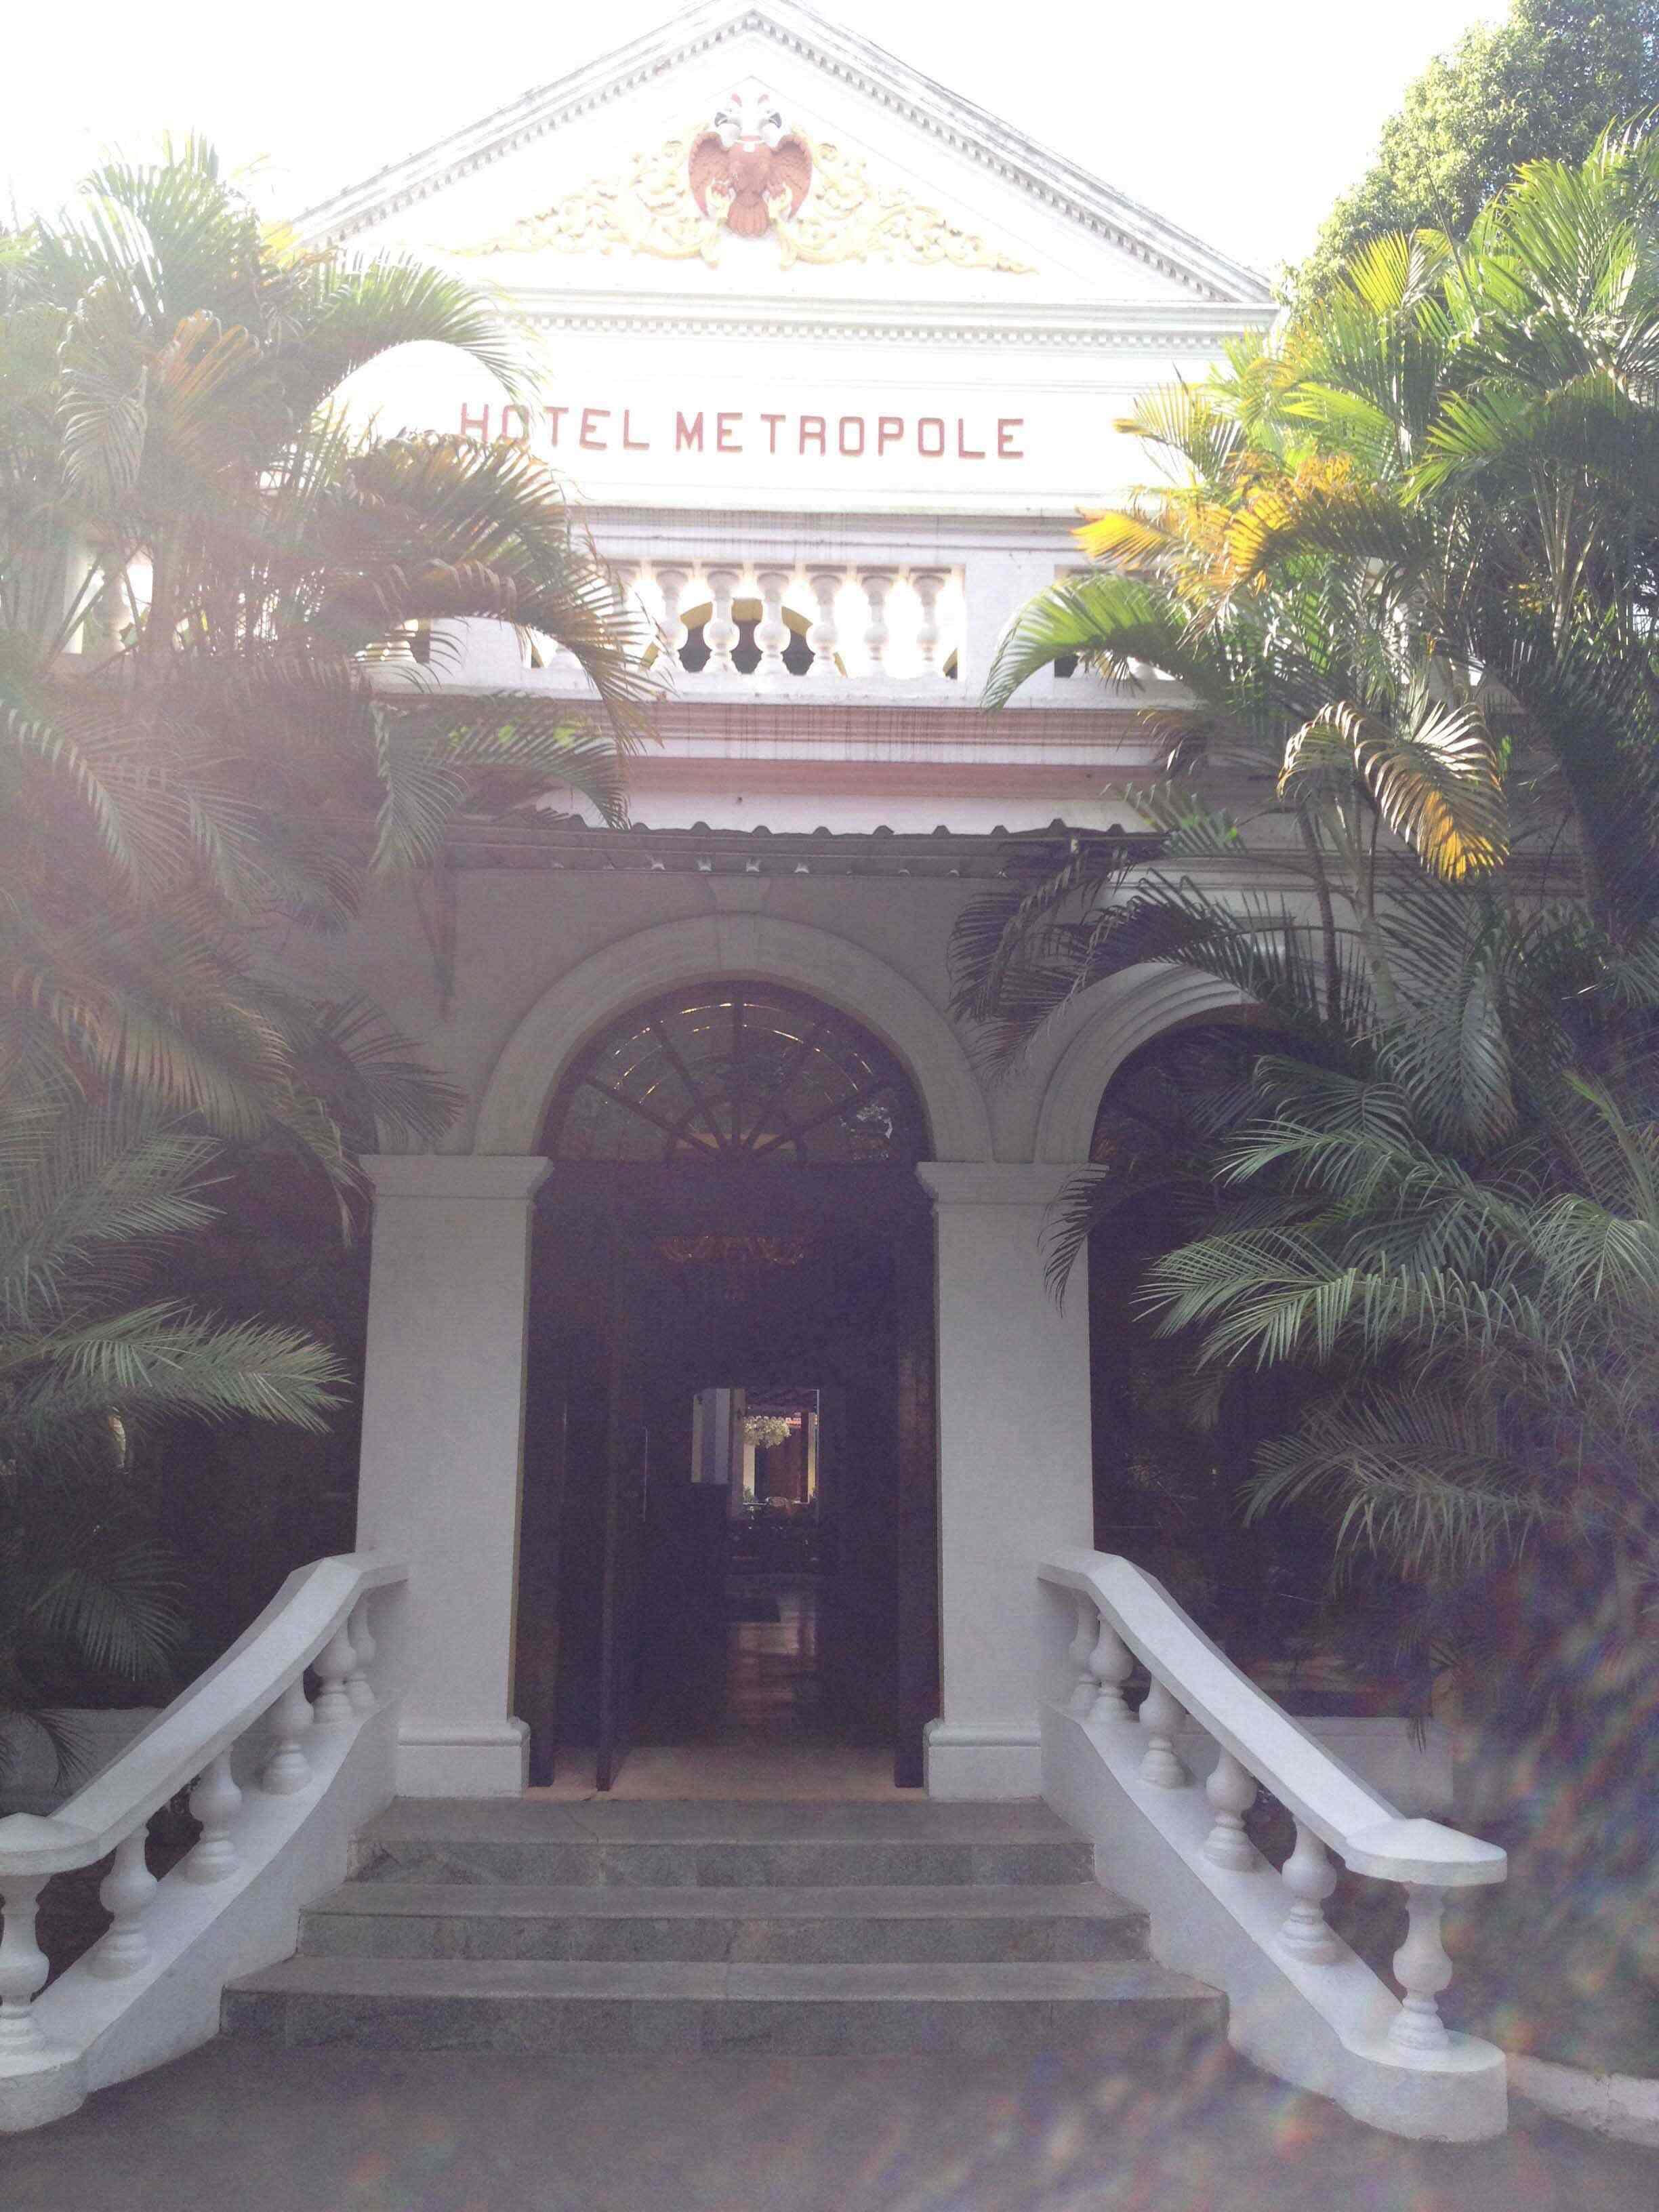 Shikari - The Court Yard Restaurant -... - Yadavgiri - Mysore Image